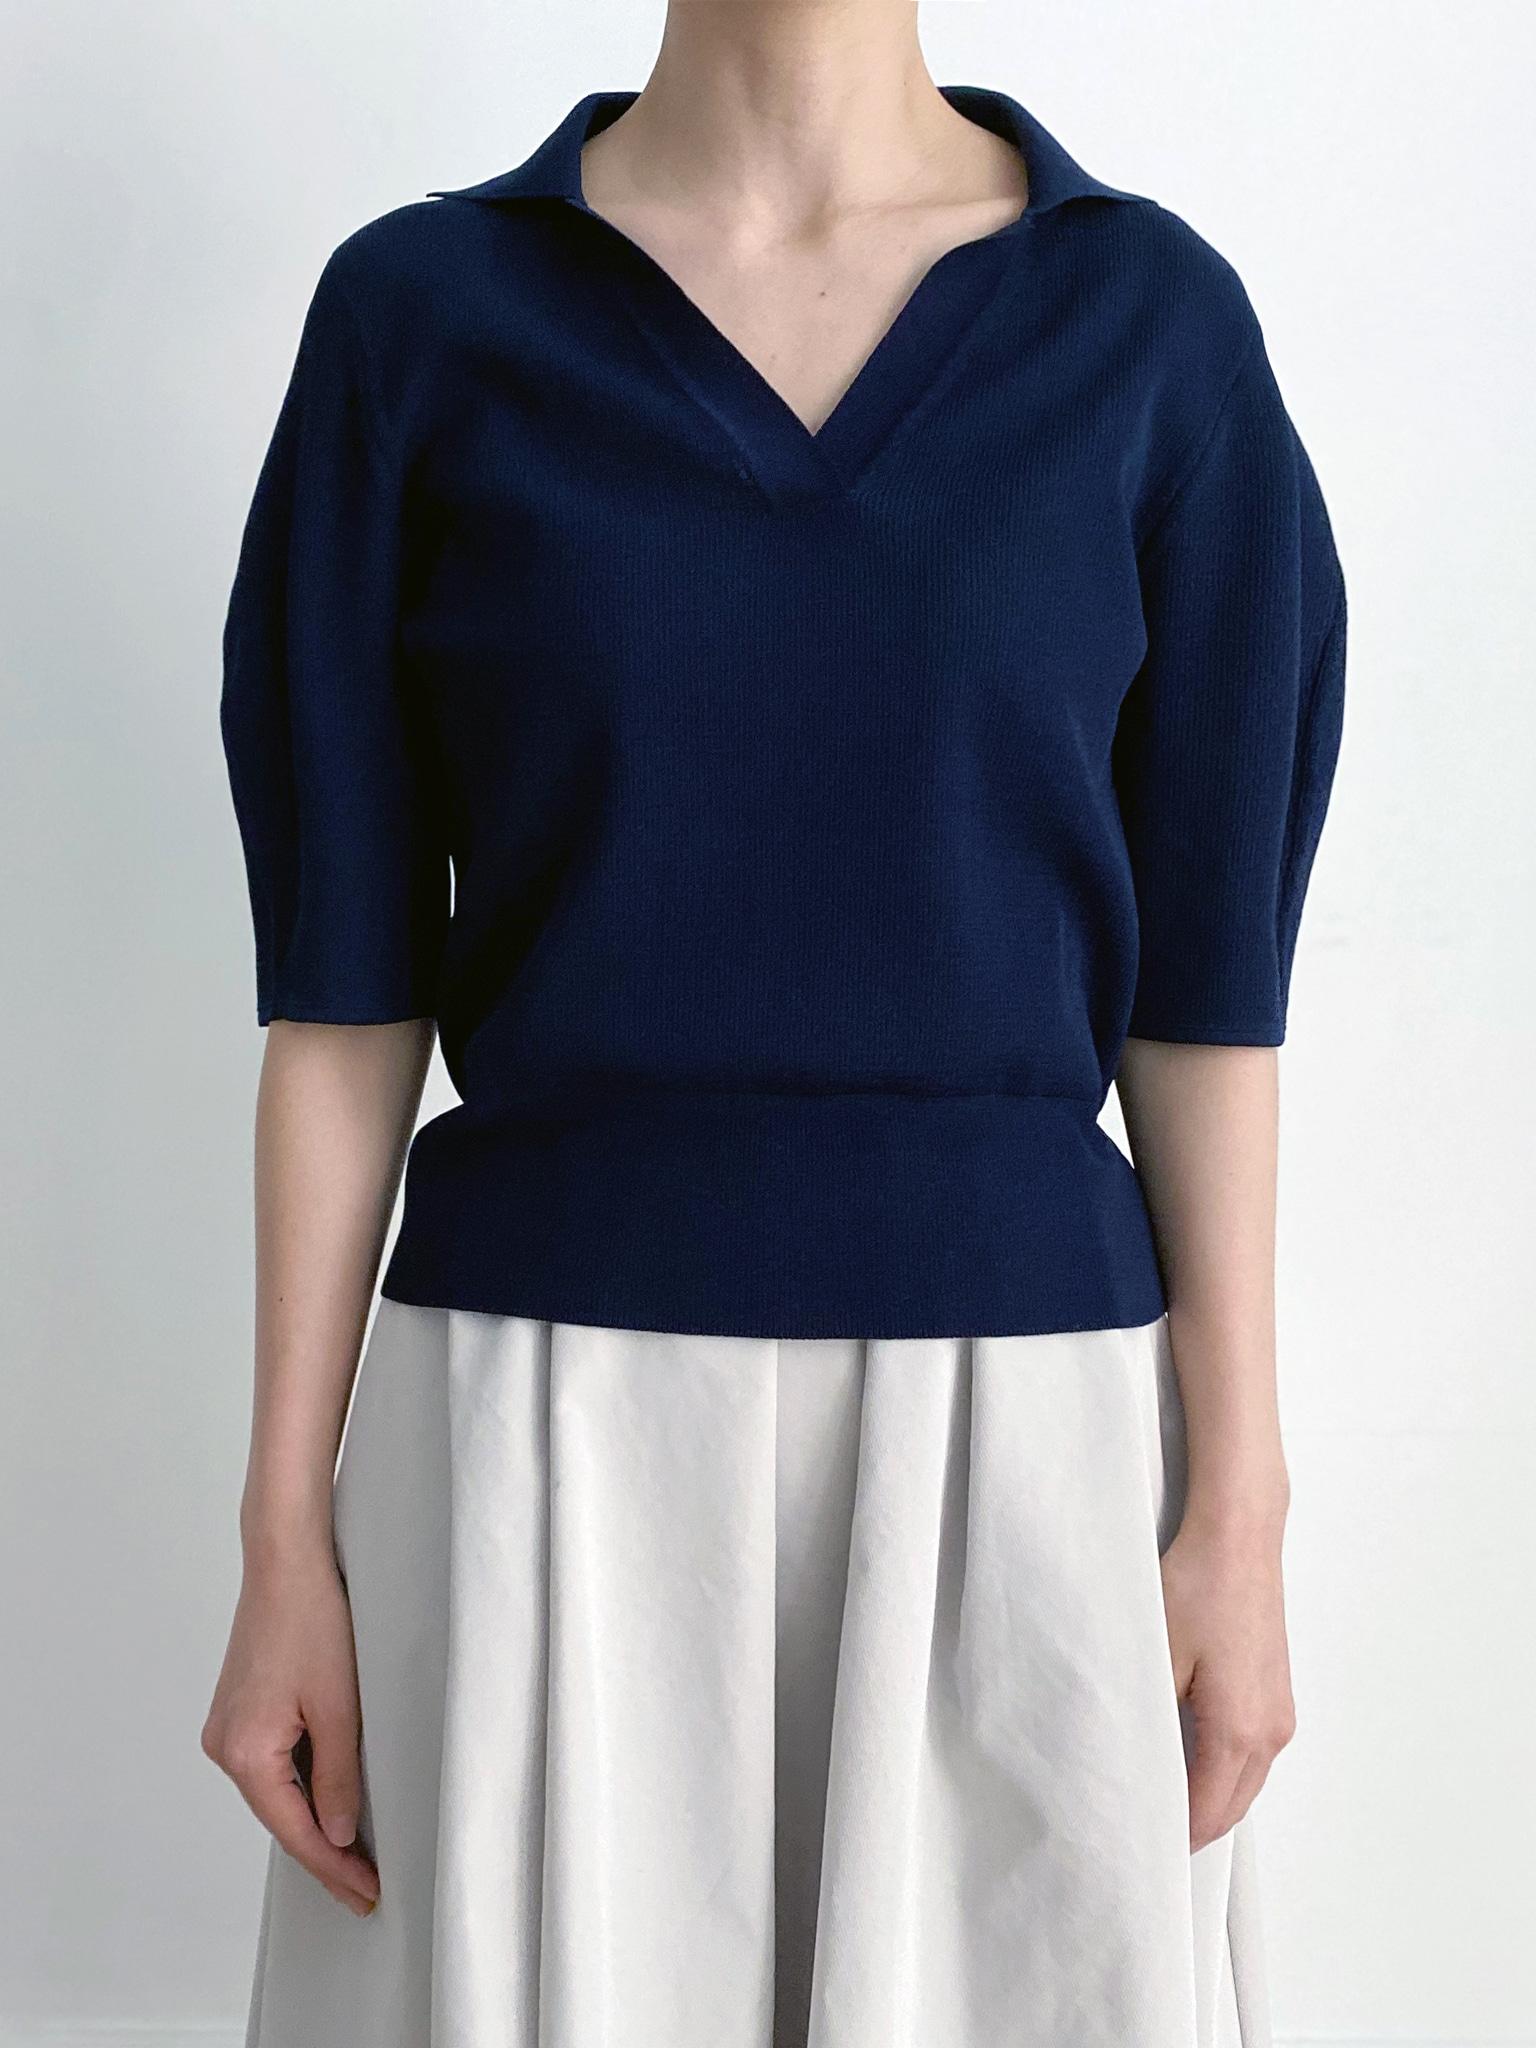 -MARE DI MARI.m- Short Balloon Sleeve Open Collar Knit